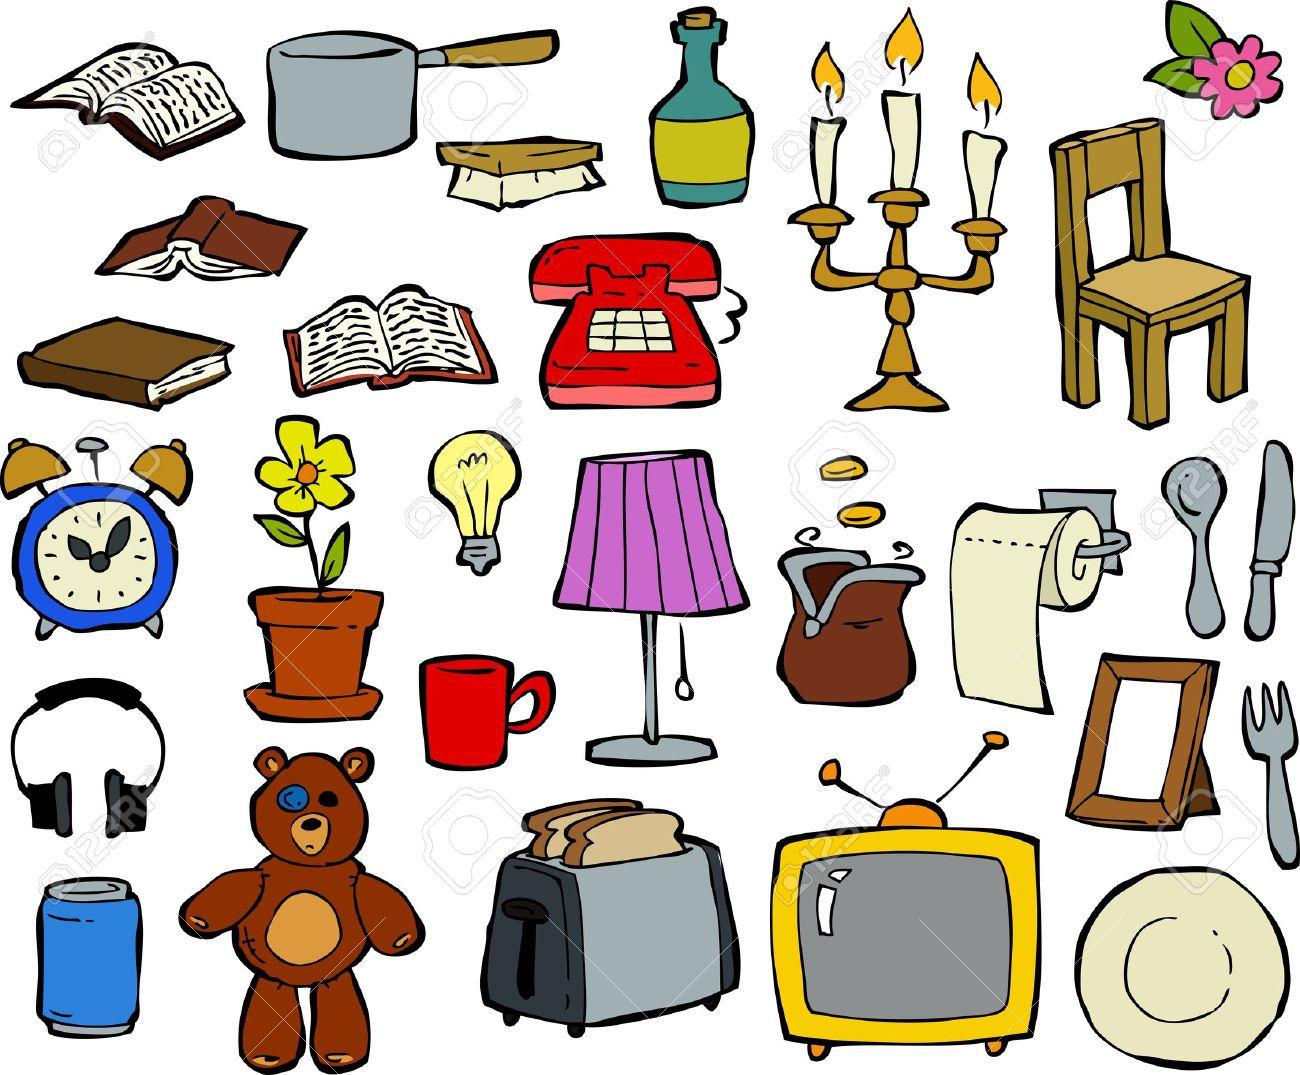 Household items doodle design elements illustration - 14814043